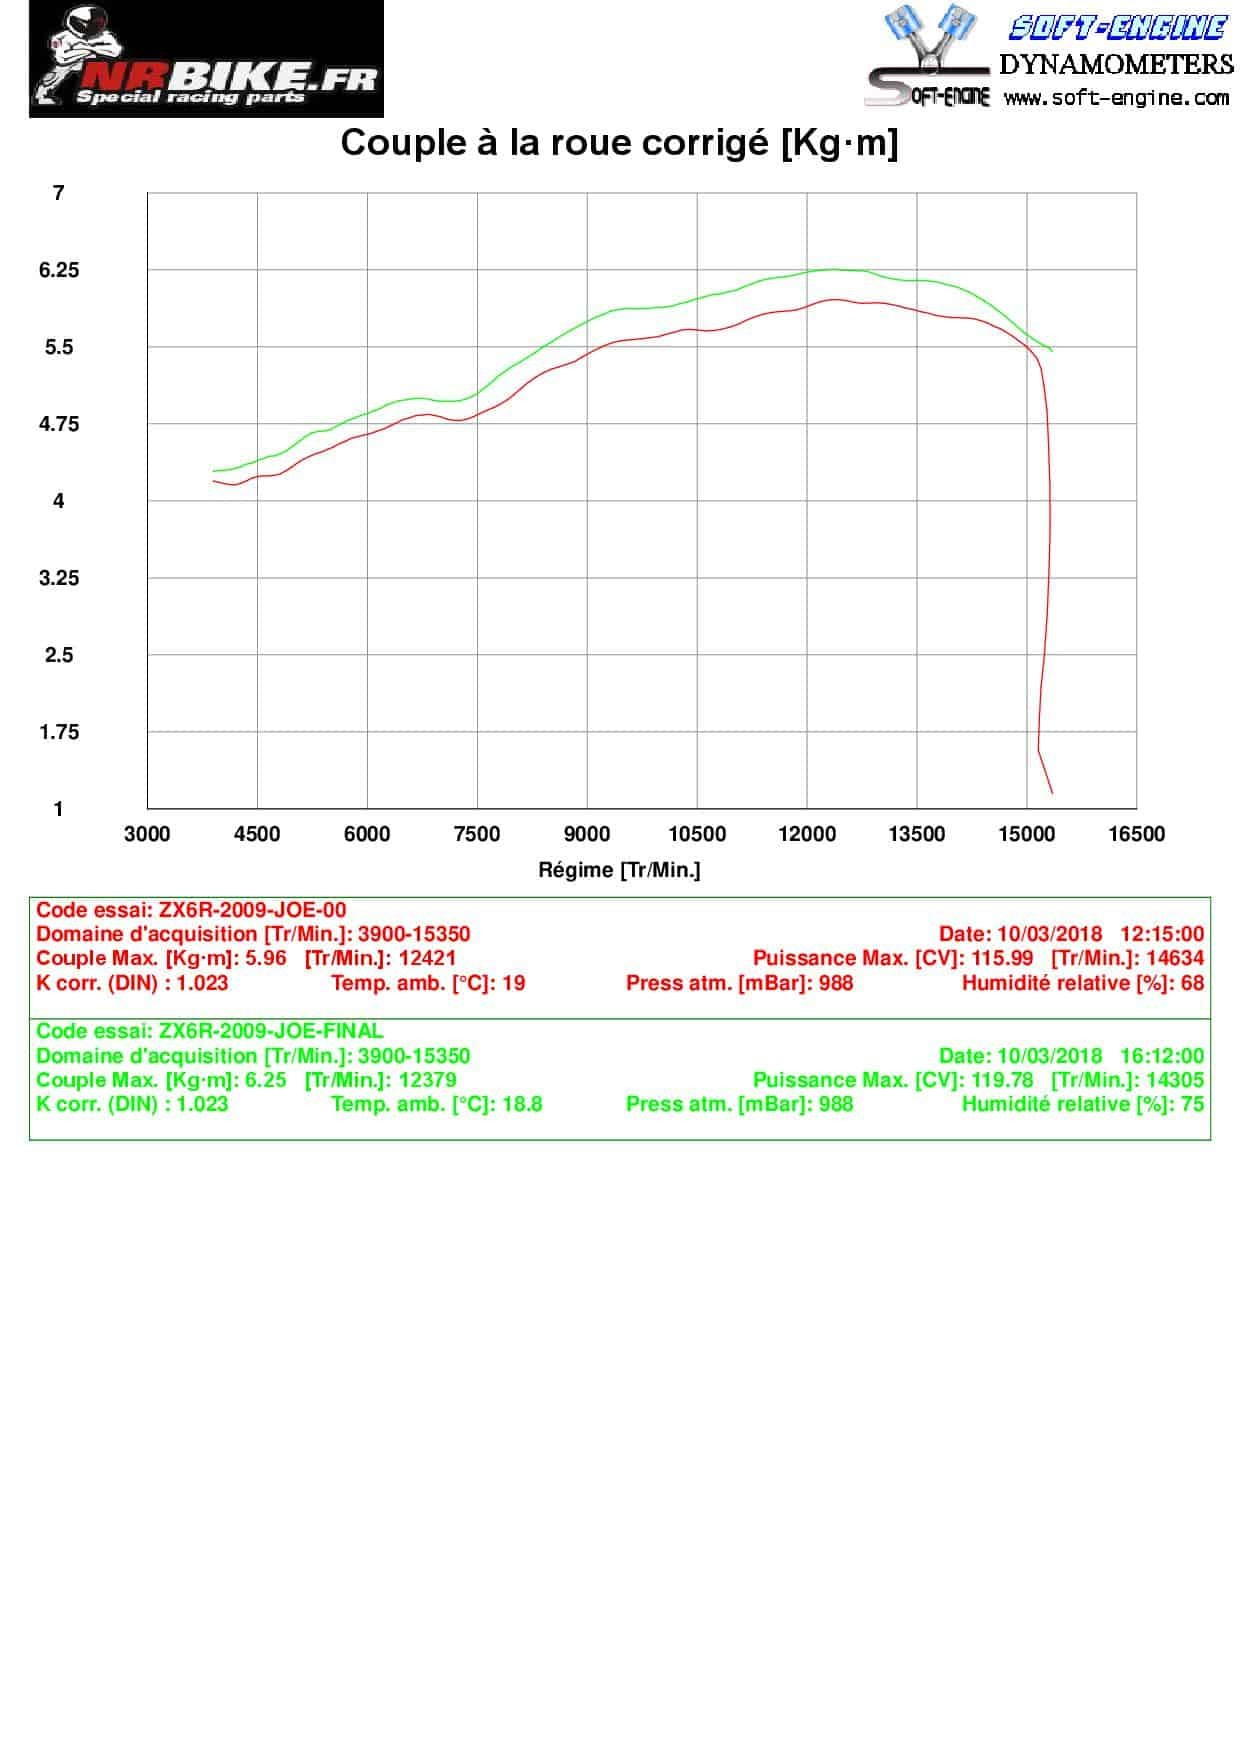 Reprogrammation boitier ECU KAWASAKI ZX6R 2009-2010